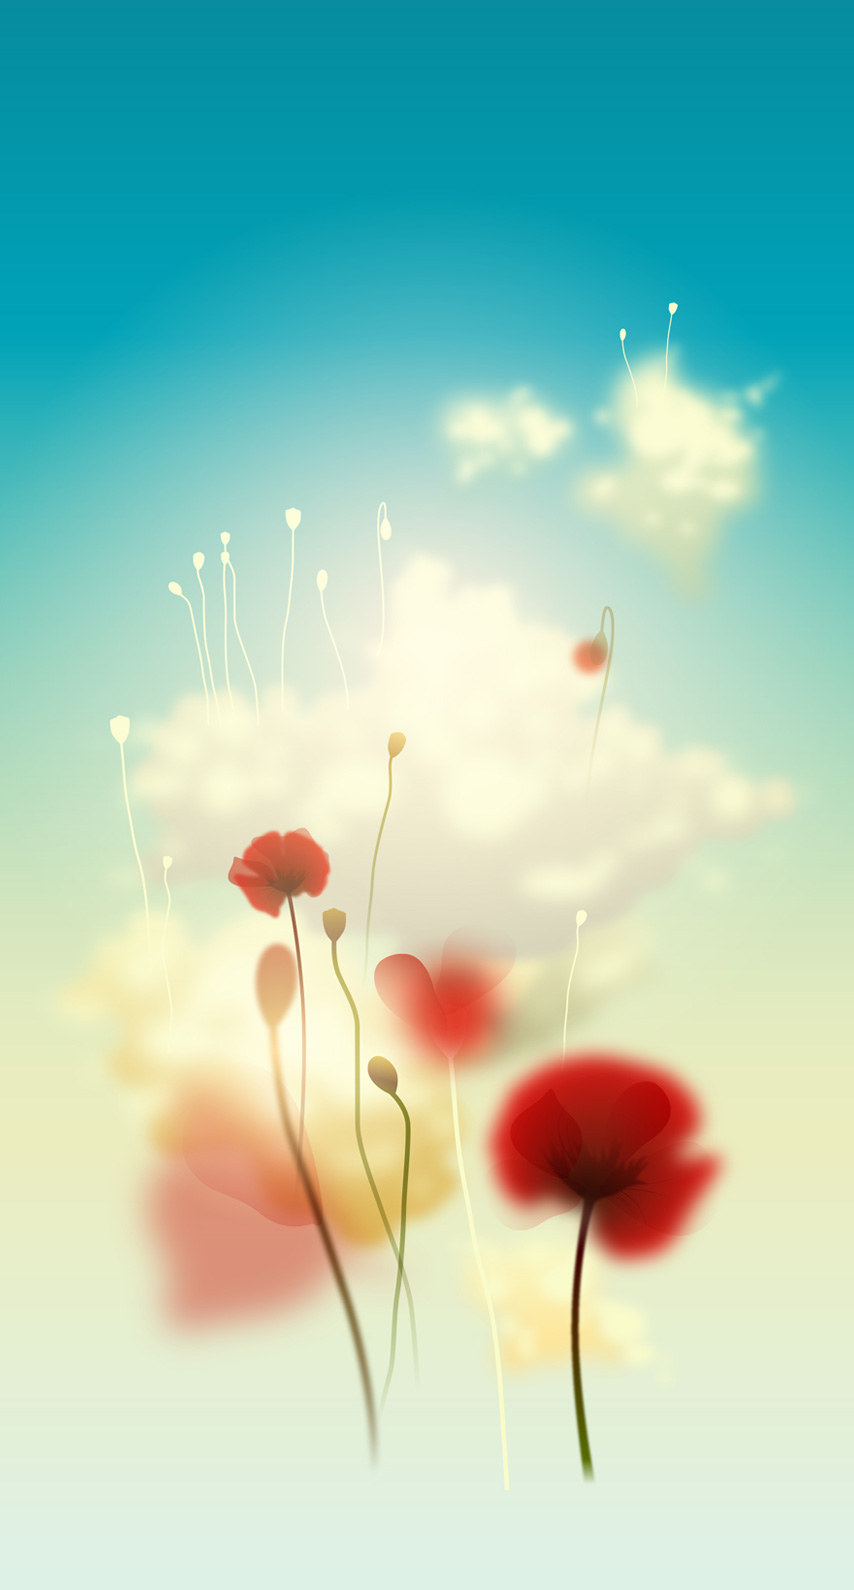 meadow, poppy